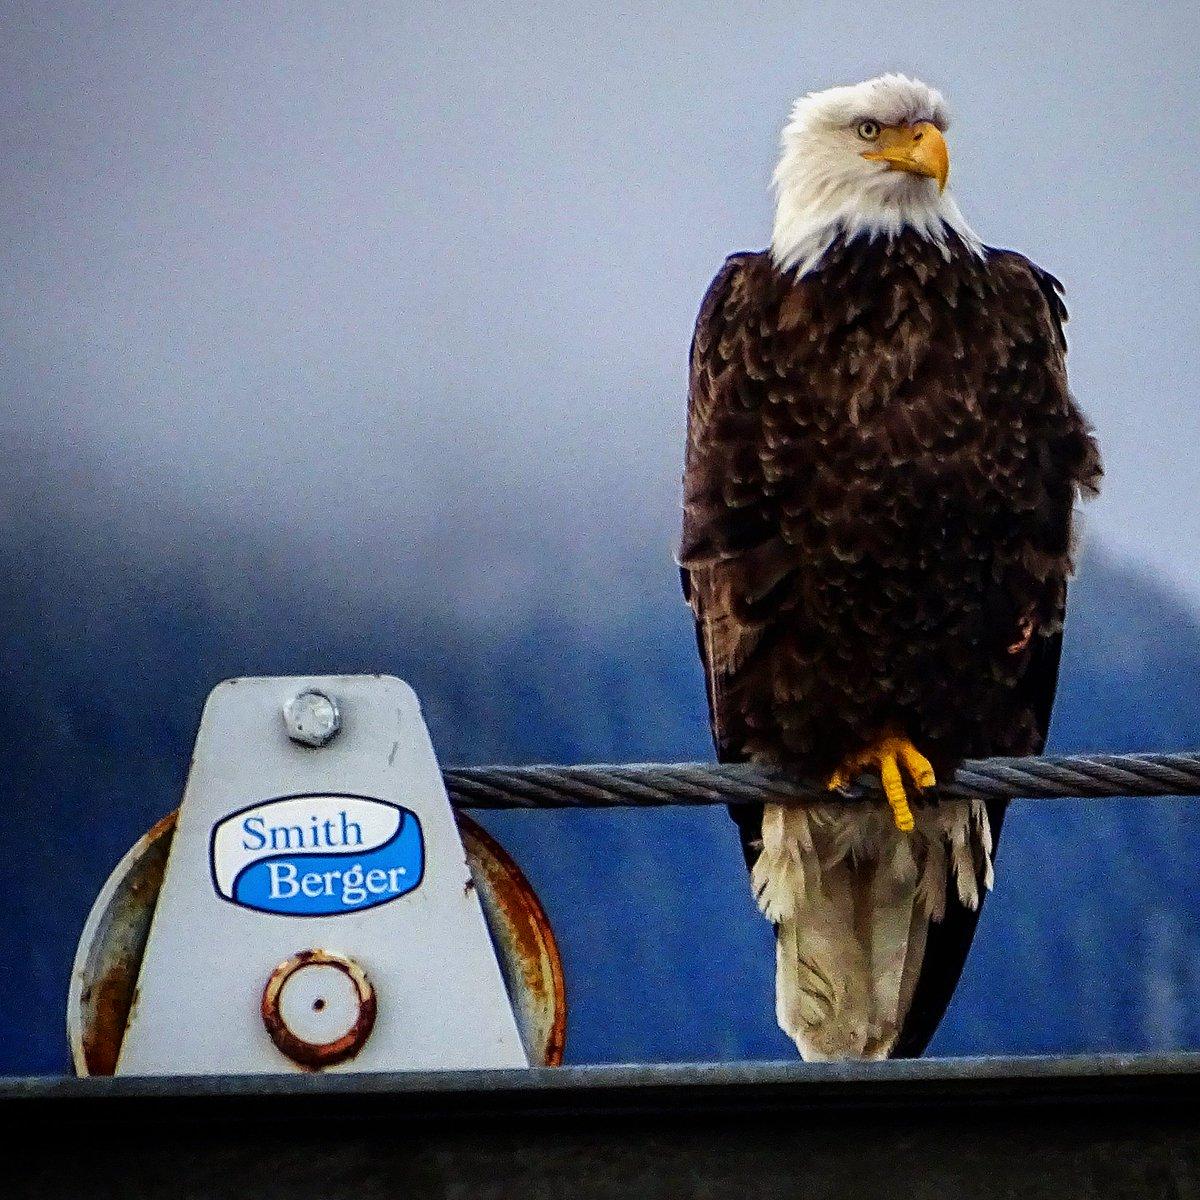 Bird on a wire. #Eagle #Baldeagle #Wildl...